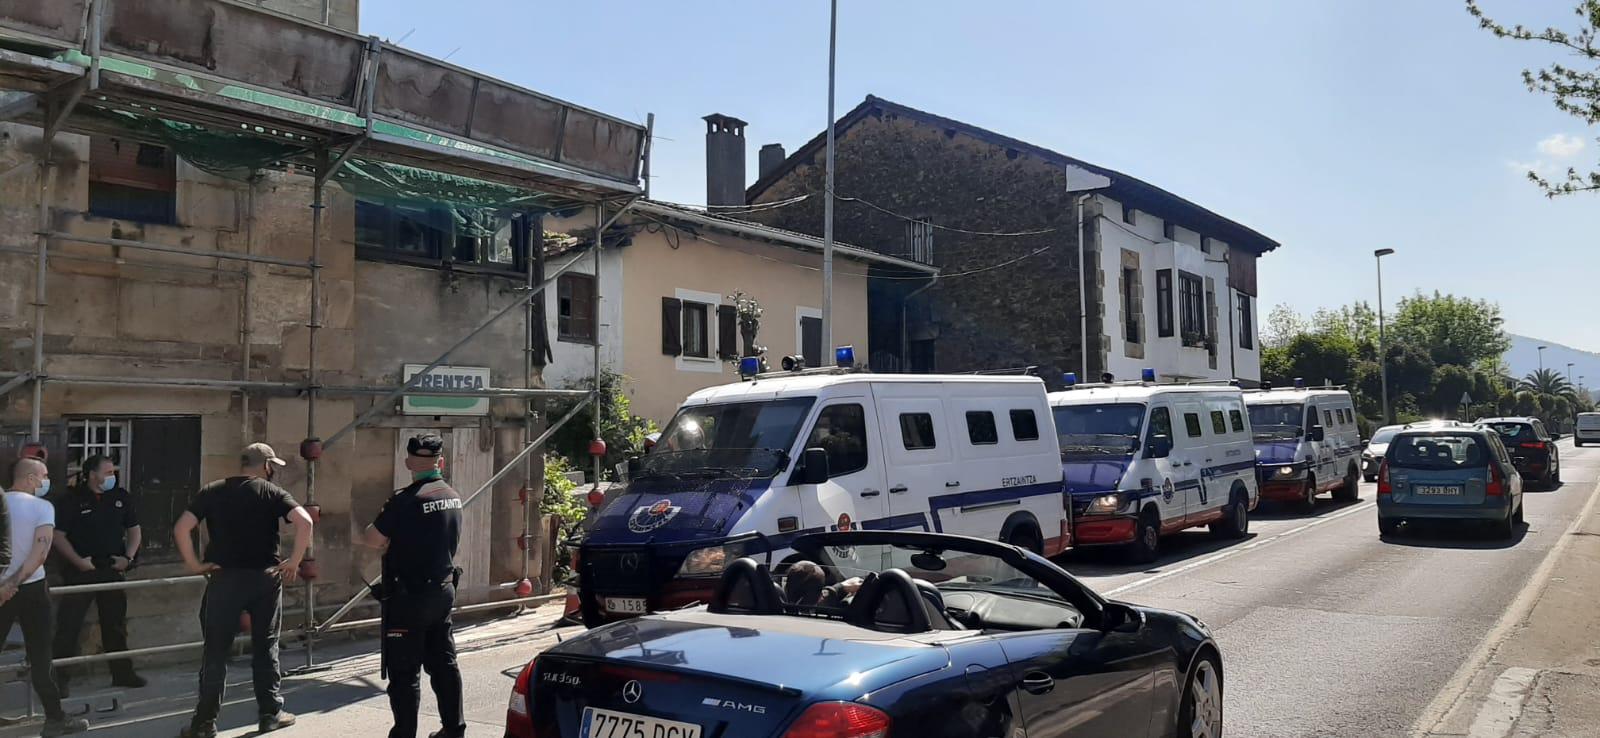 [dotb.eus] Desalojan una casa ocupada en Abadiño